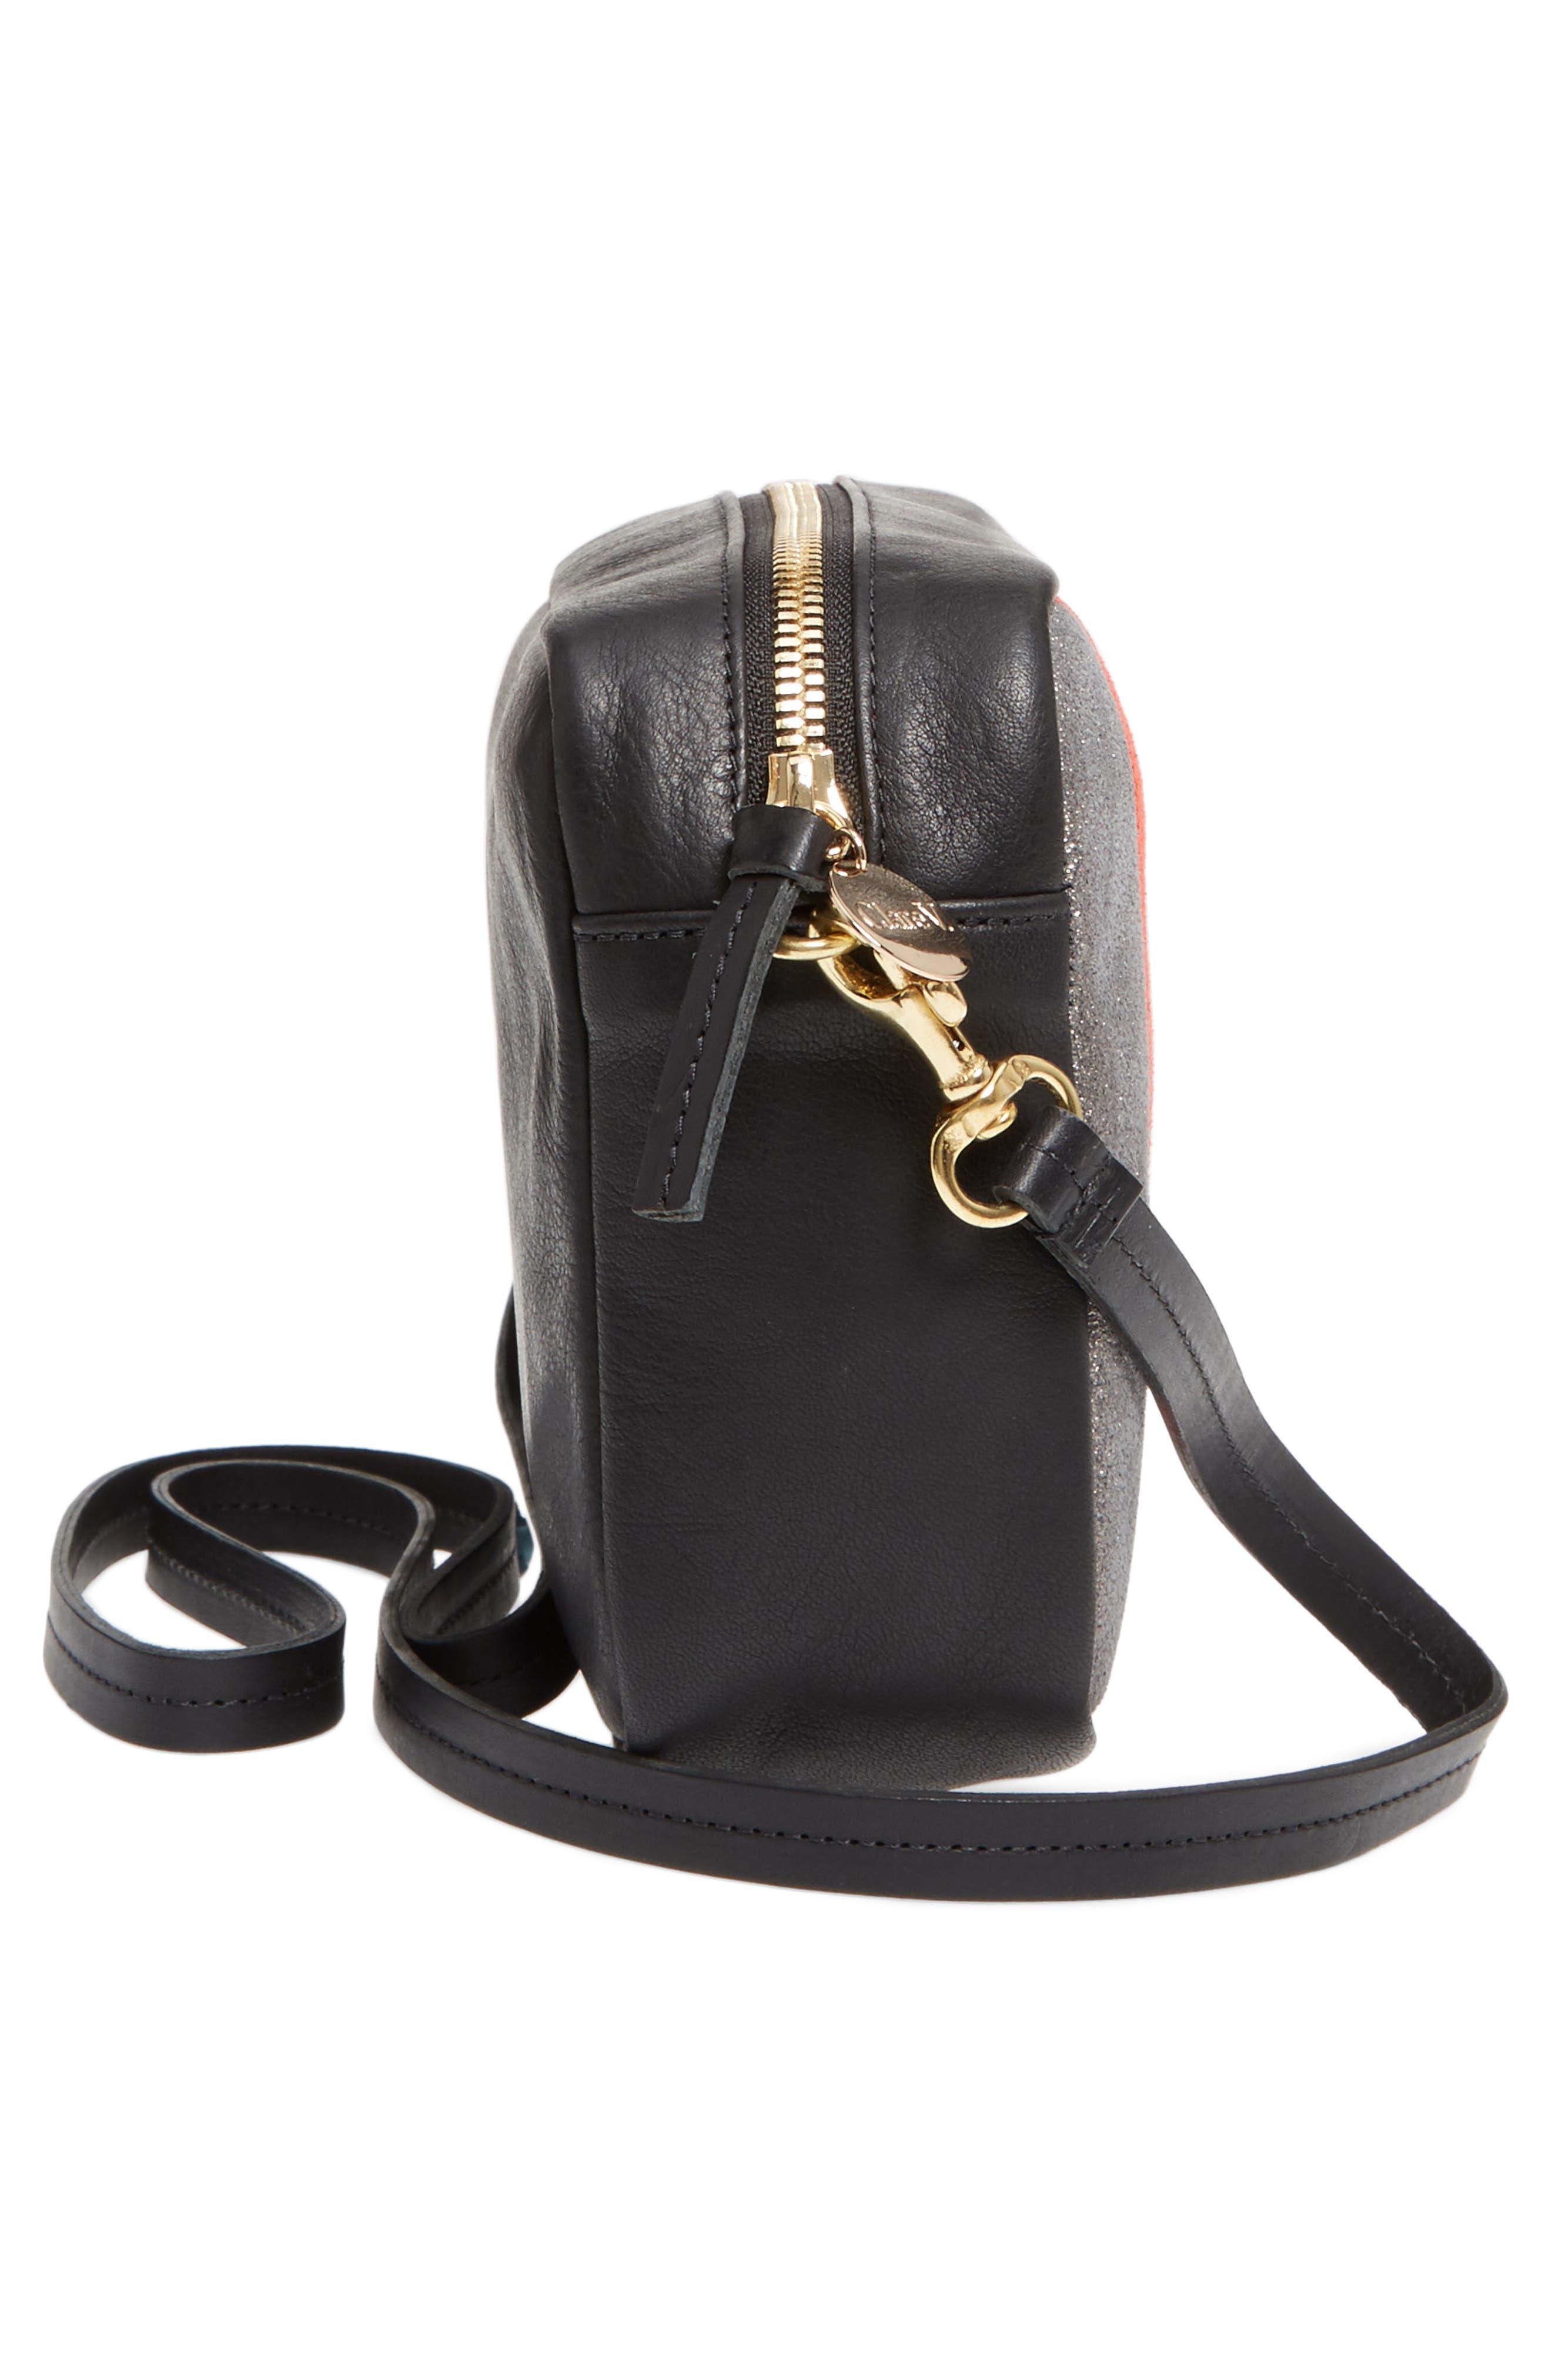 Midi Sac Stripe Leather Crossbody Bag,                             Alternate thumbnail 5, color,                             610